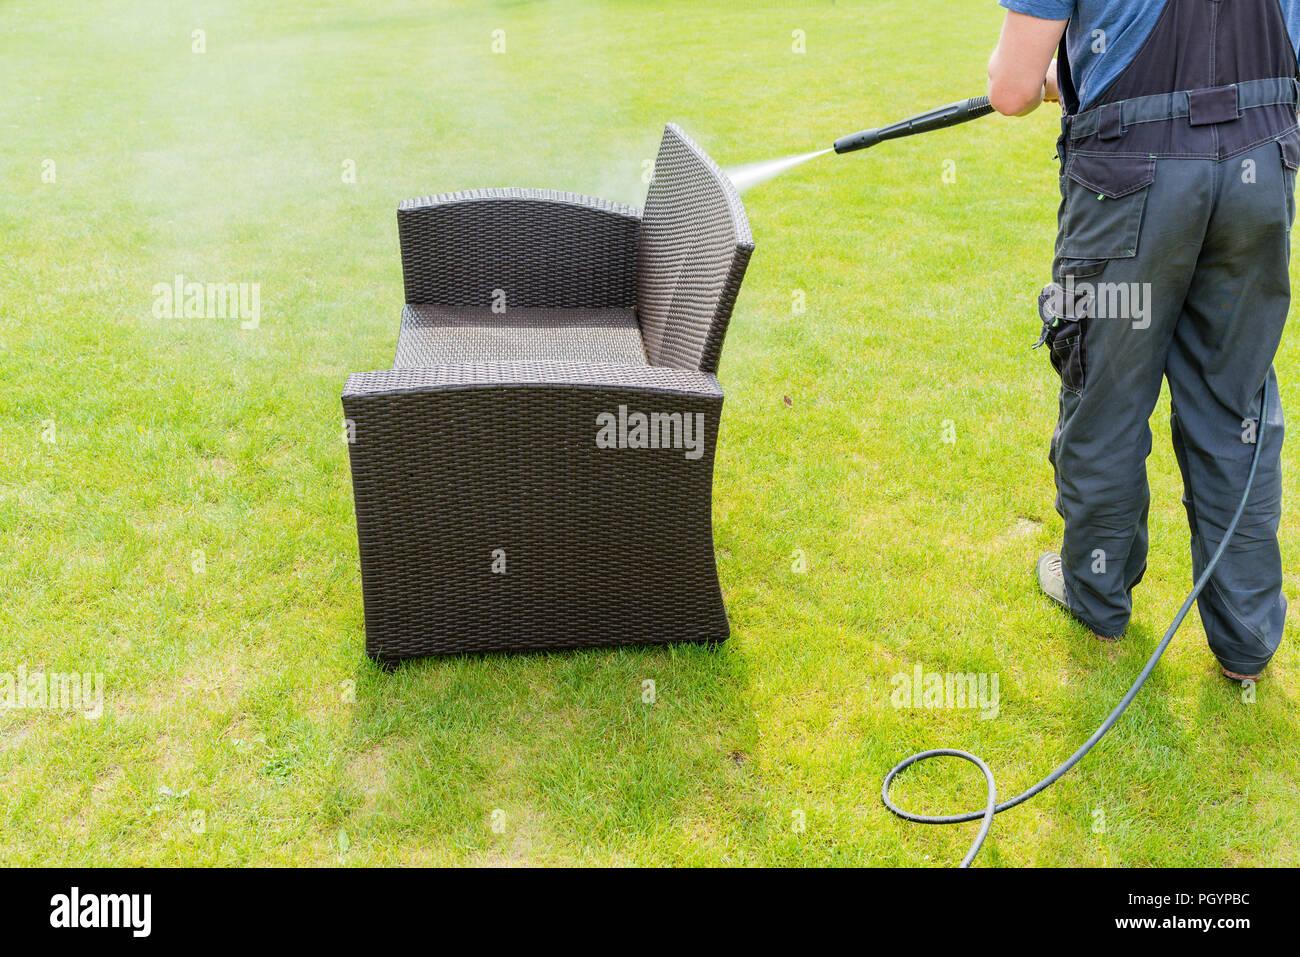 power washing garden furniture - made of rattan Stock Photo